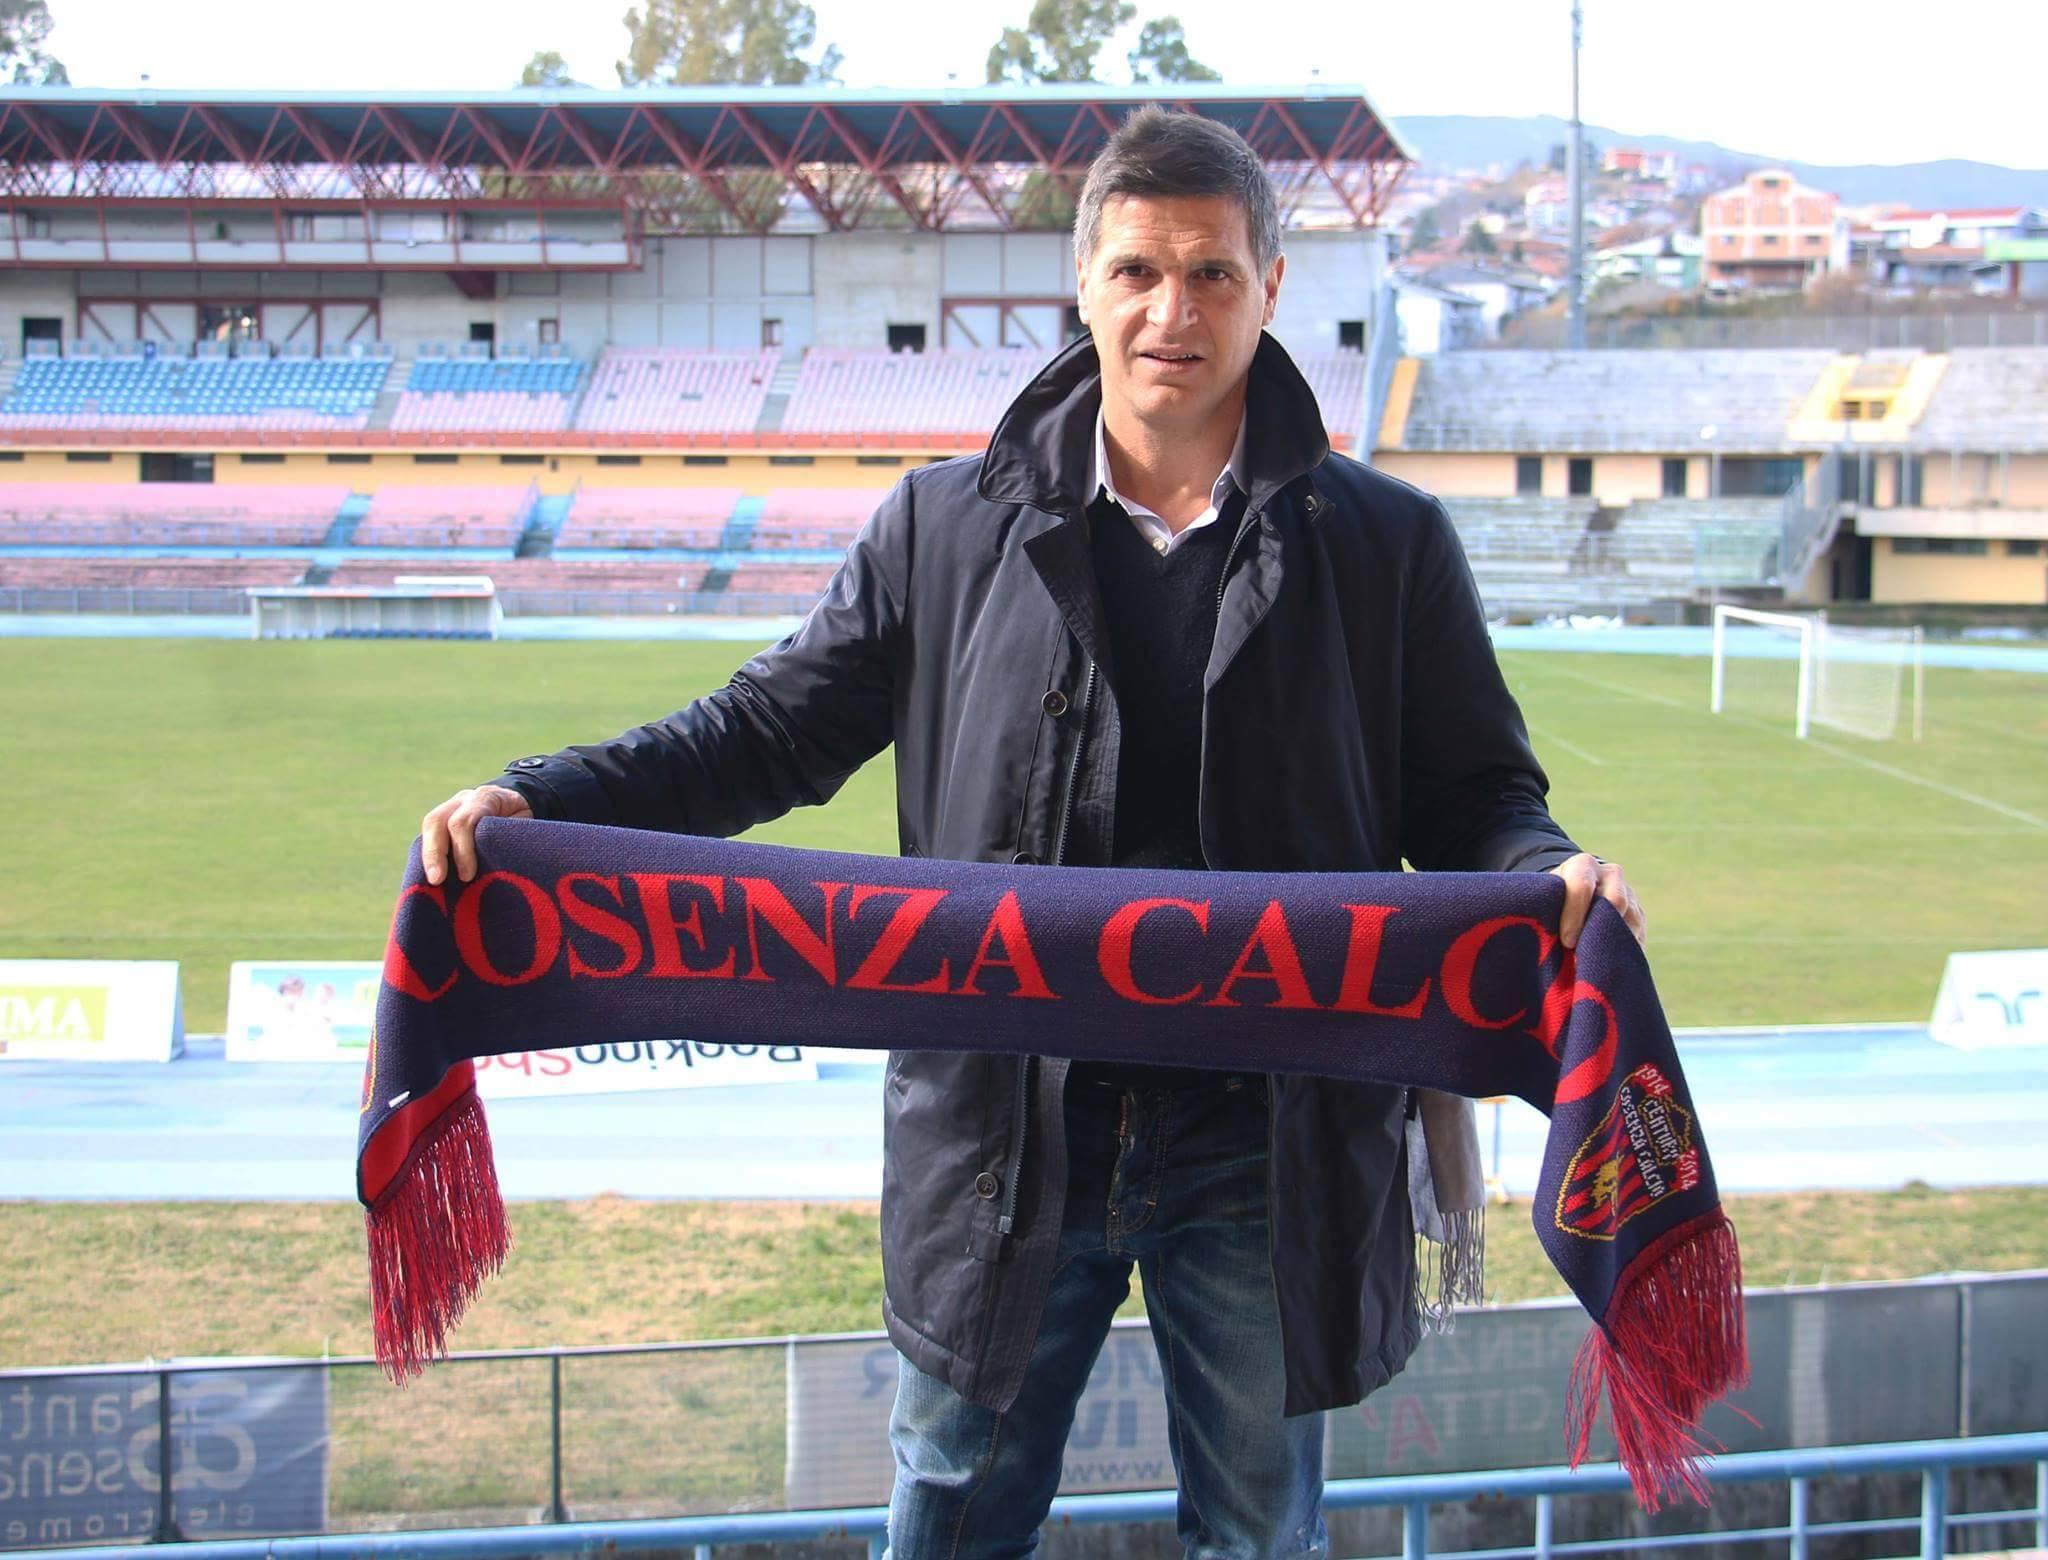 Aladino Valoti Ph Cosenza.it